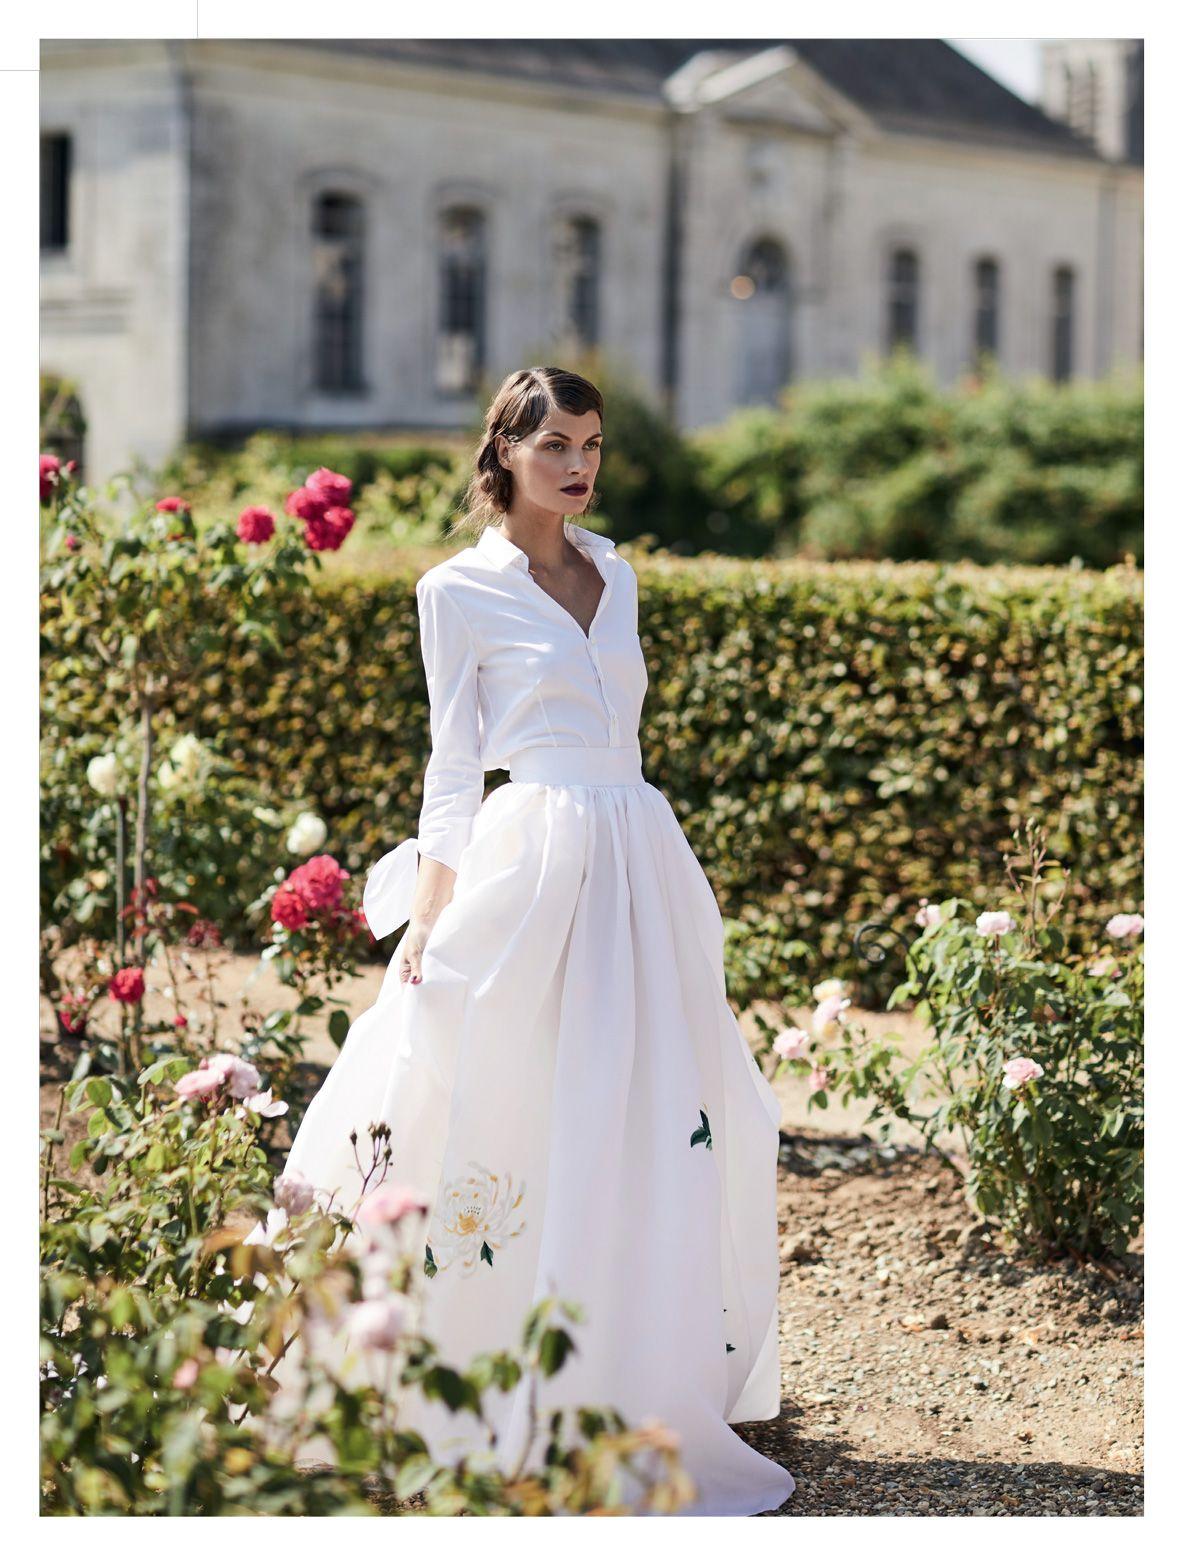 Carolina Herrera Bridal In Brides Uk Carolina Herrera Bridal Wedding Dress Shirt Wedding Skirt